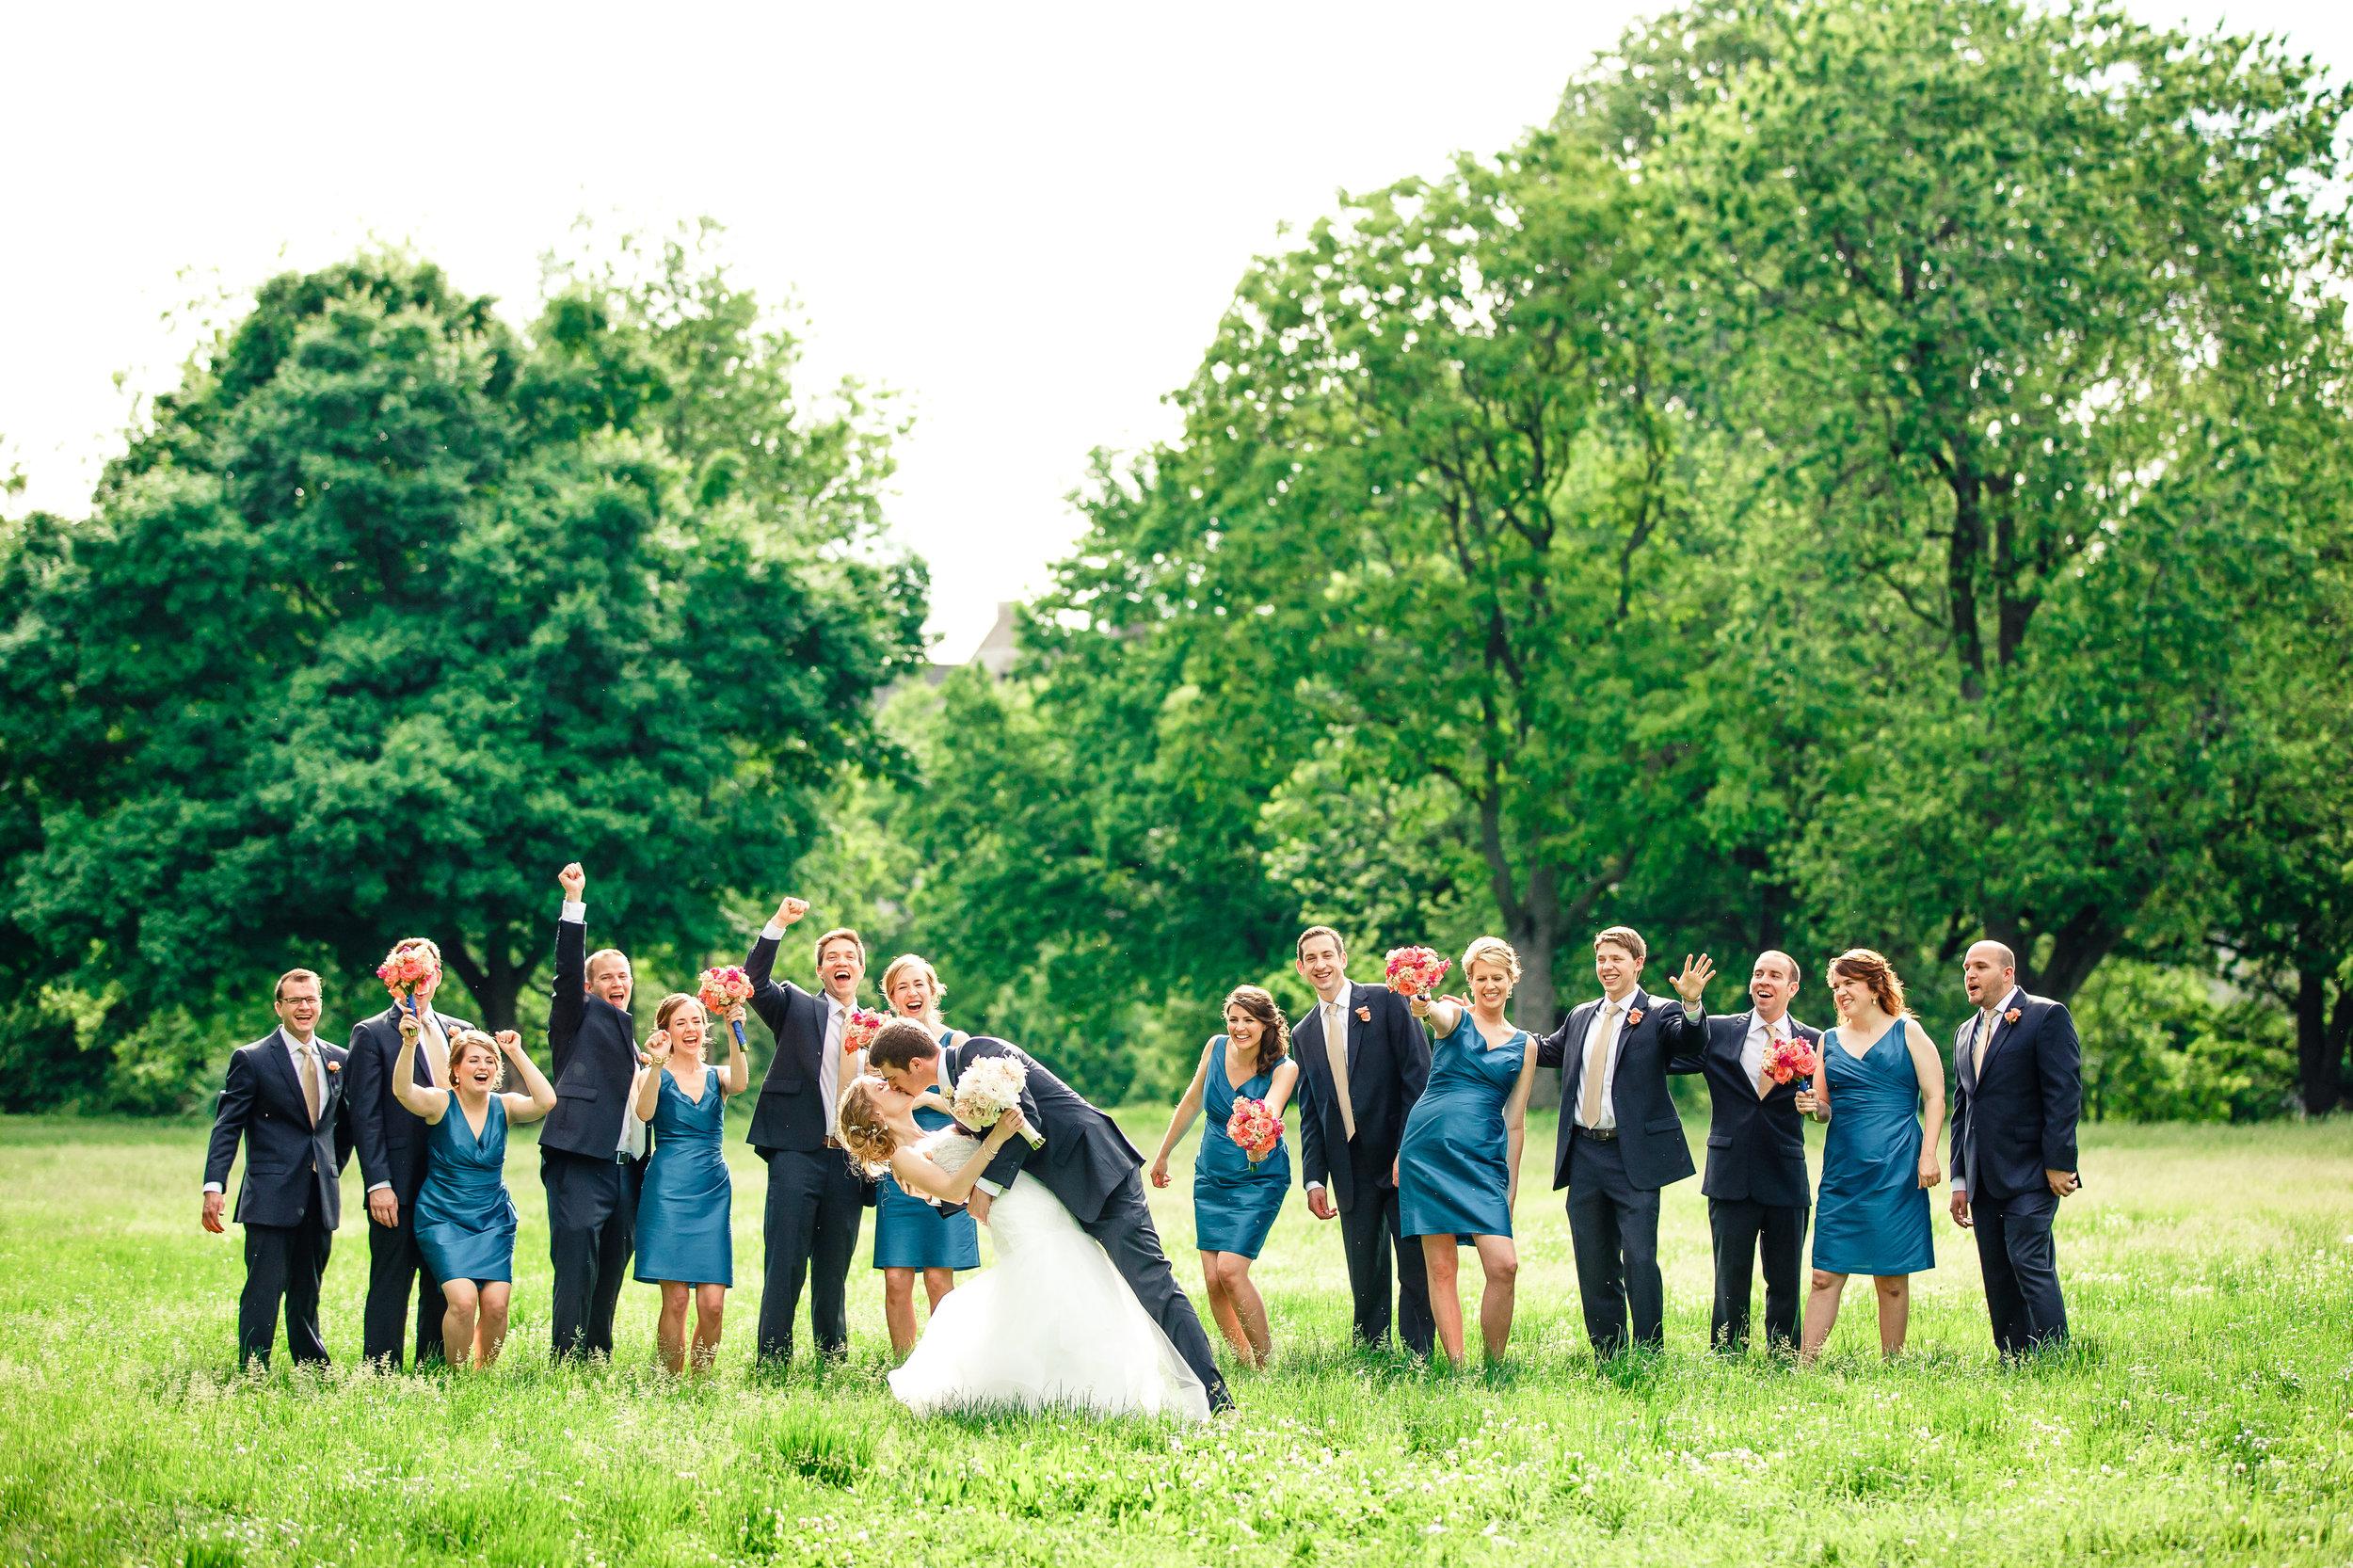 Lafayette Square Park St. Louis Wedding Photographer Oldani Photography 3.jpg